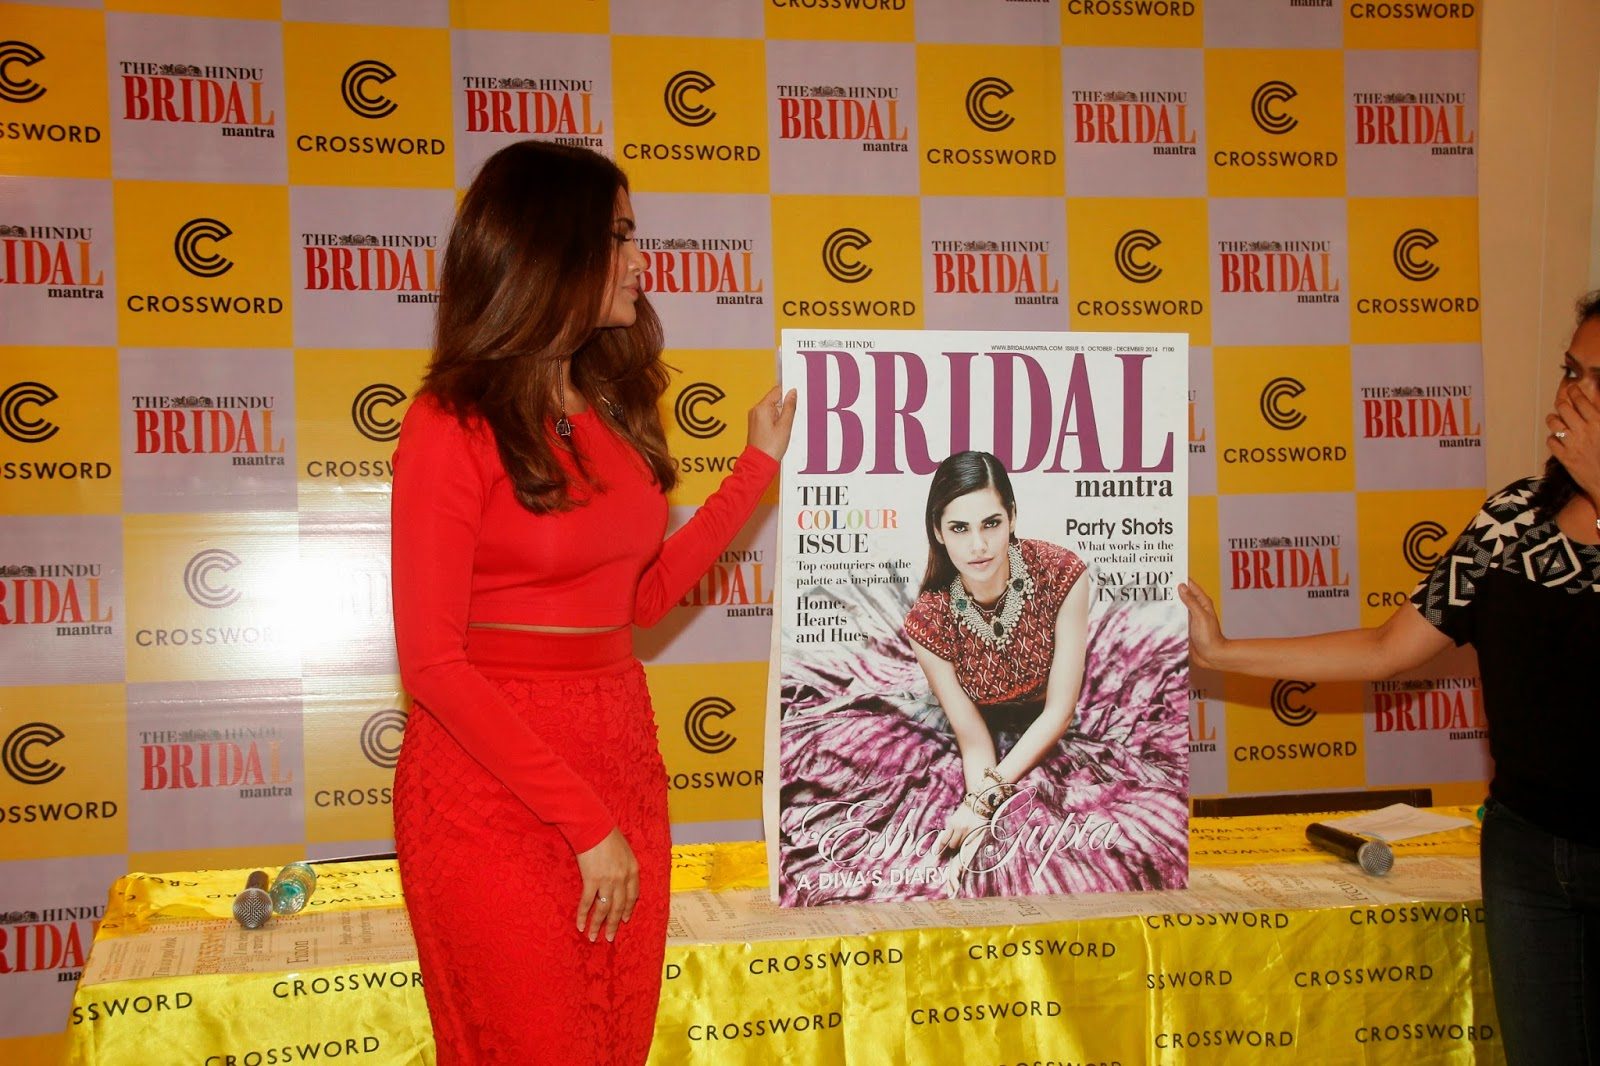 Esha Gupta at 5th Hindu Bridal Mantra Magazine Cover Stills